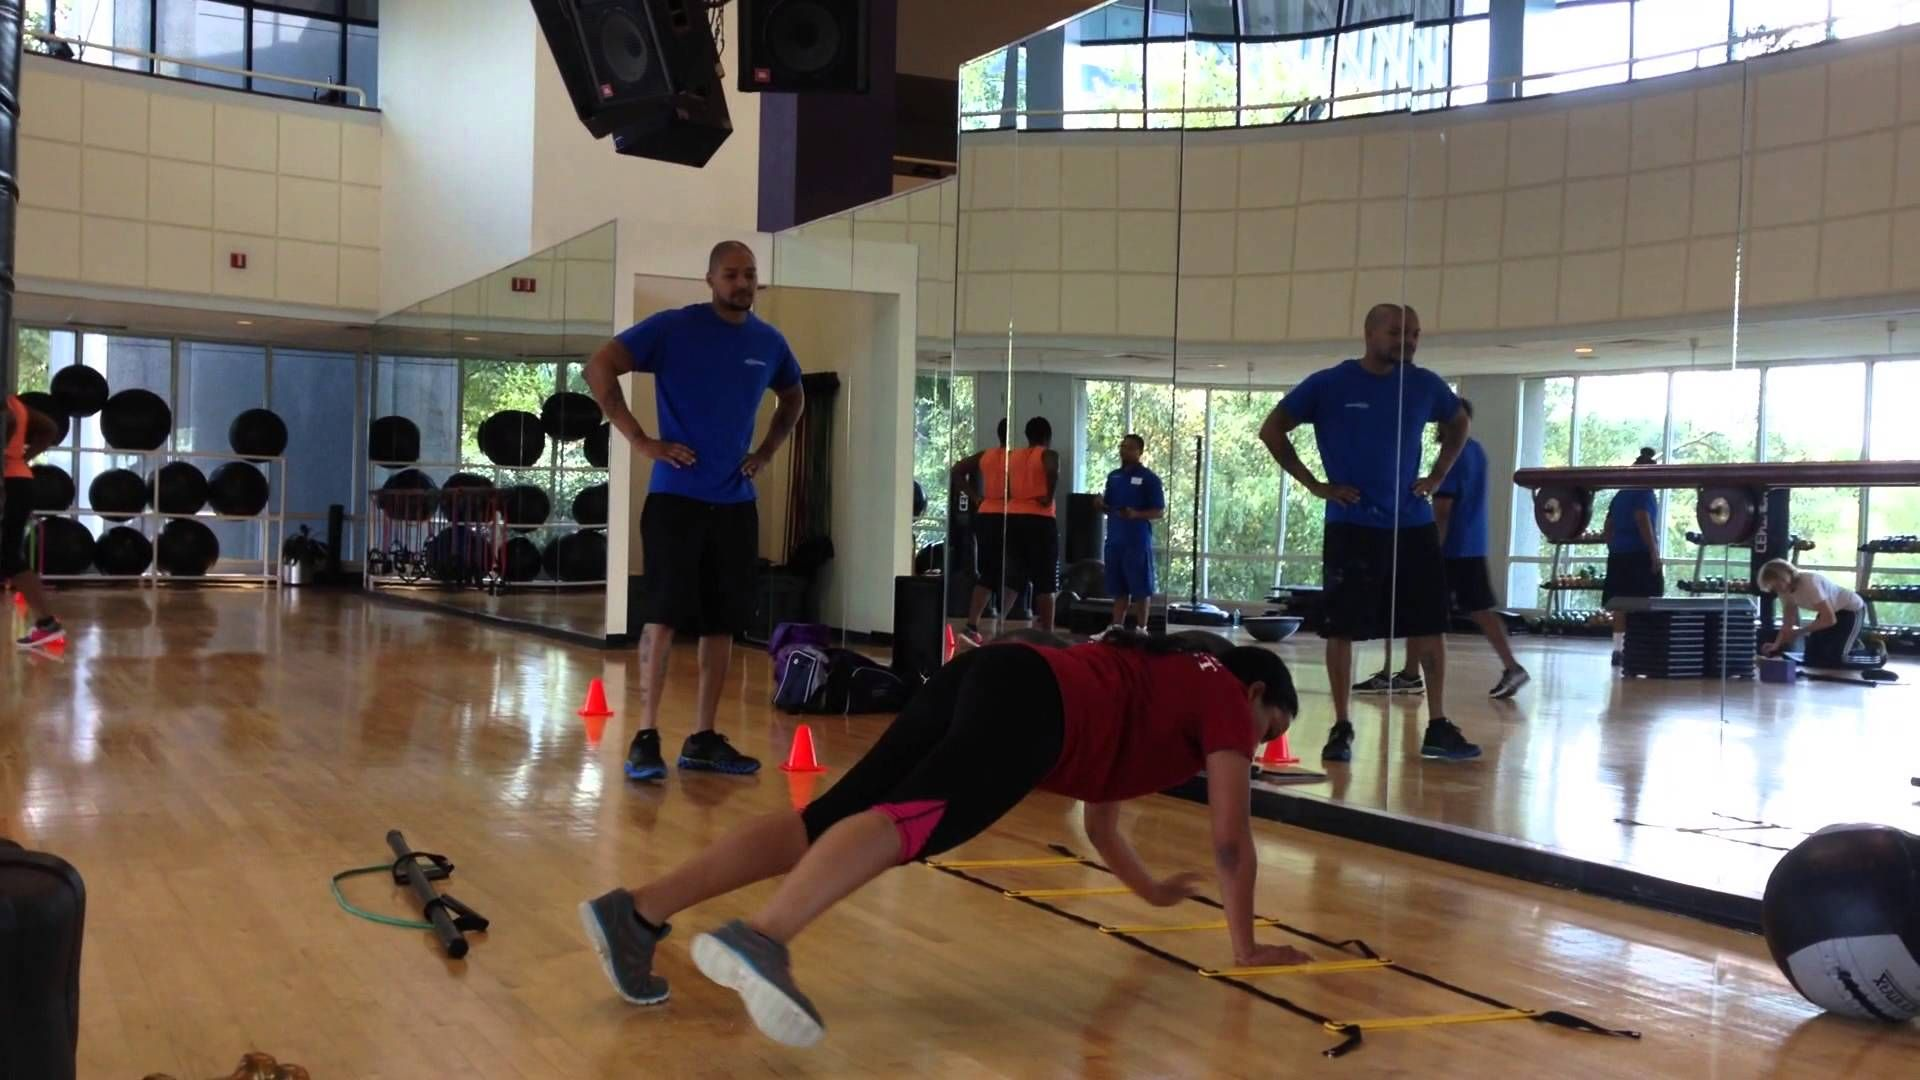 Atlanta Personal Trainer Program students train clients at ...